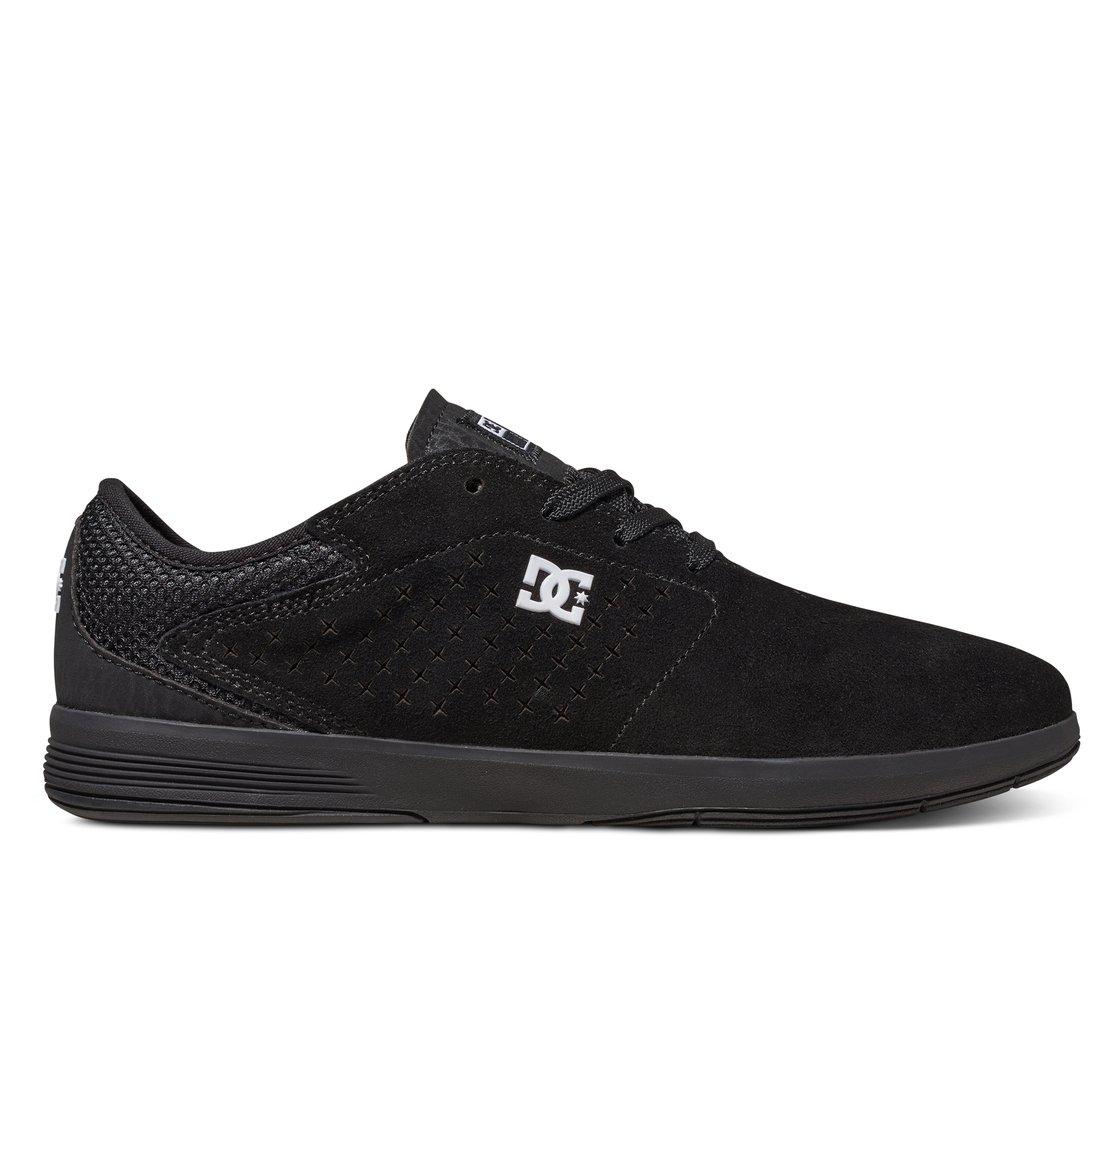 Skate shoes dc - 0 Men S New Jack S Skate Shoes Black Adys100324 Dc Shoes